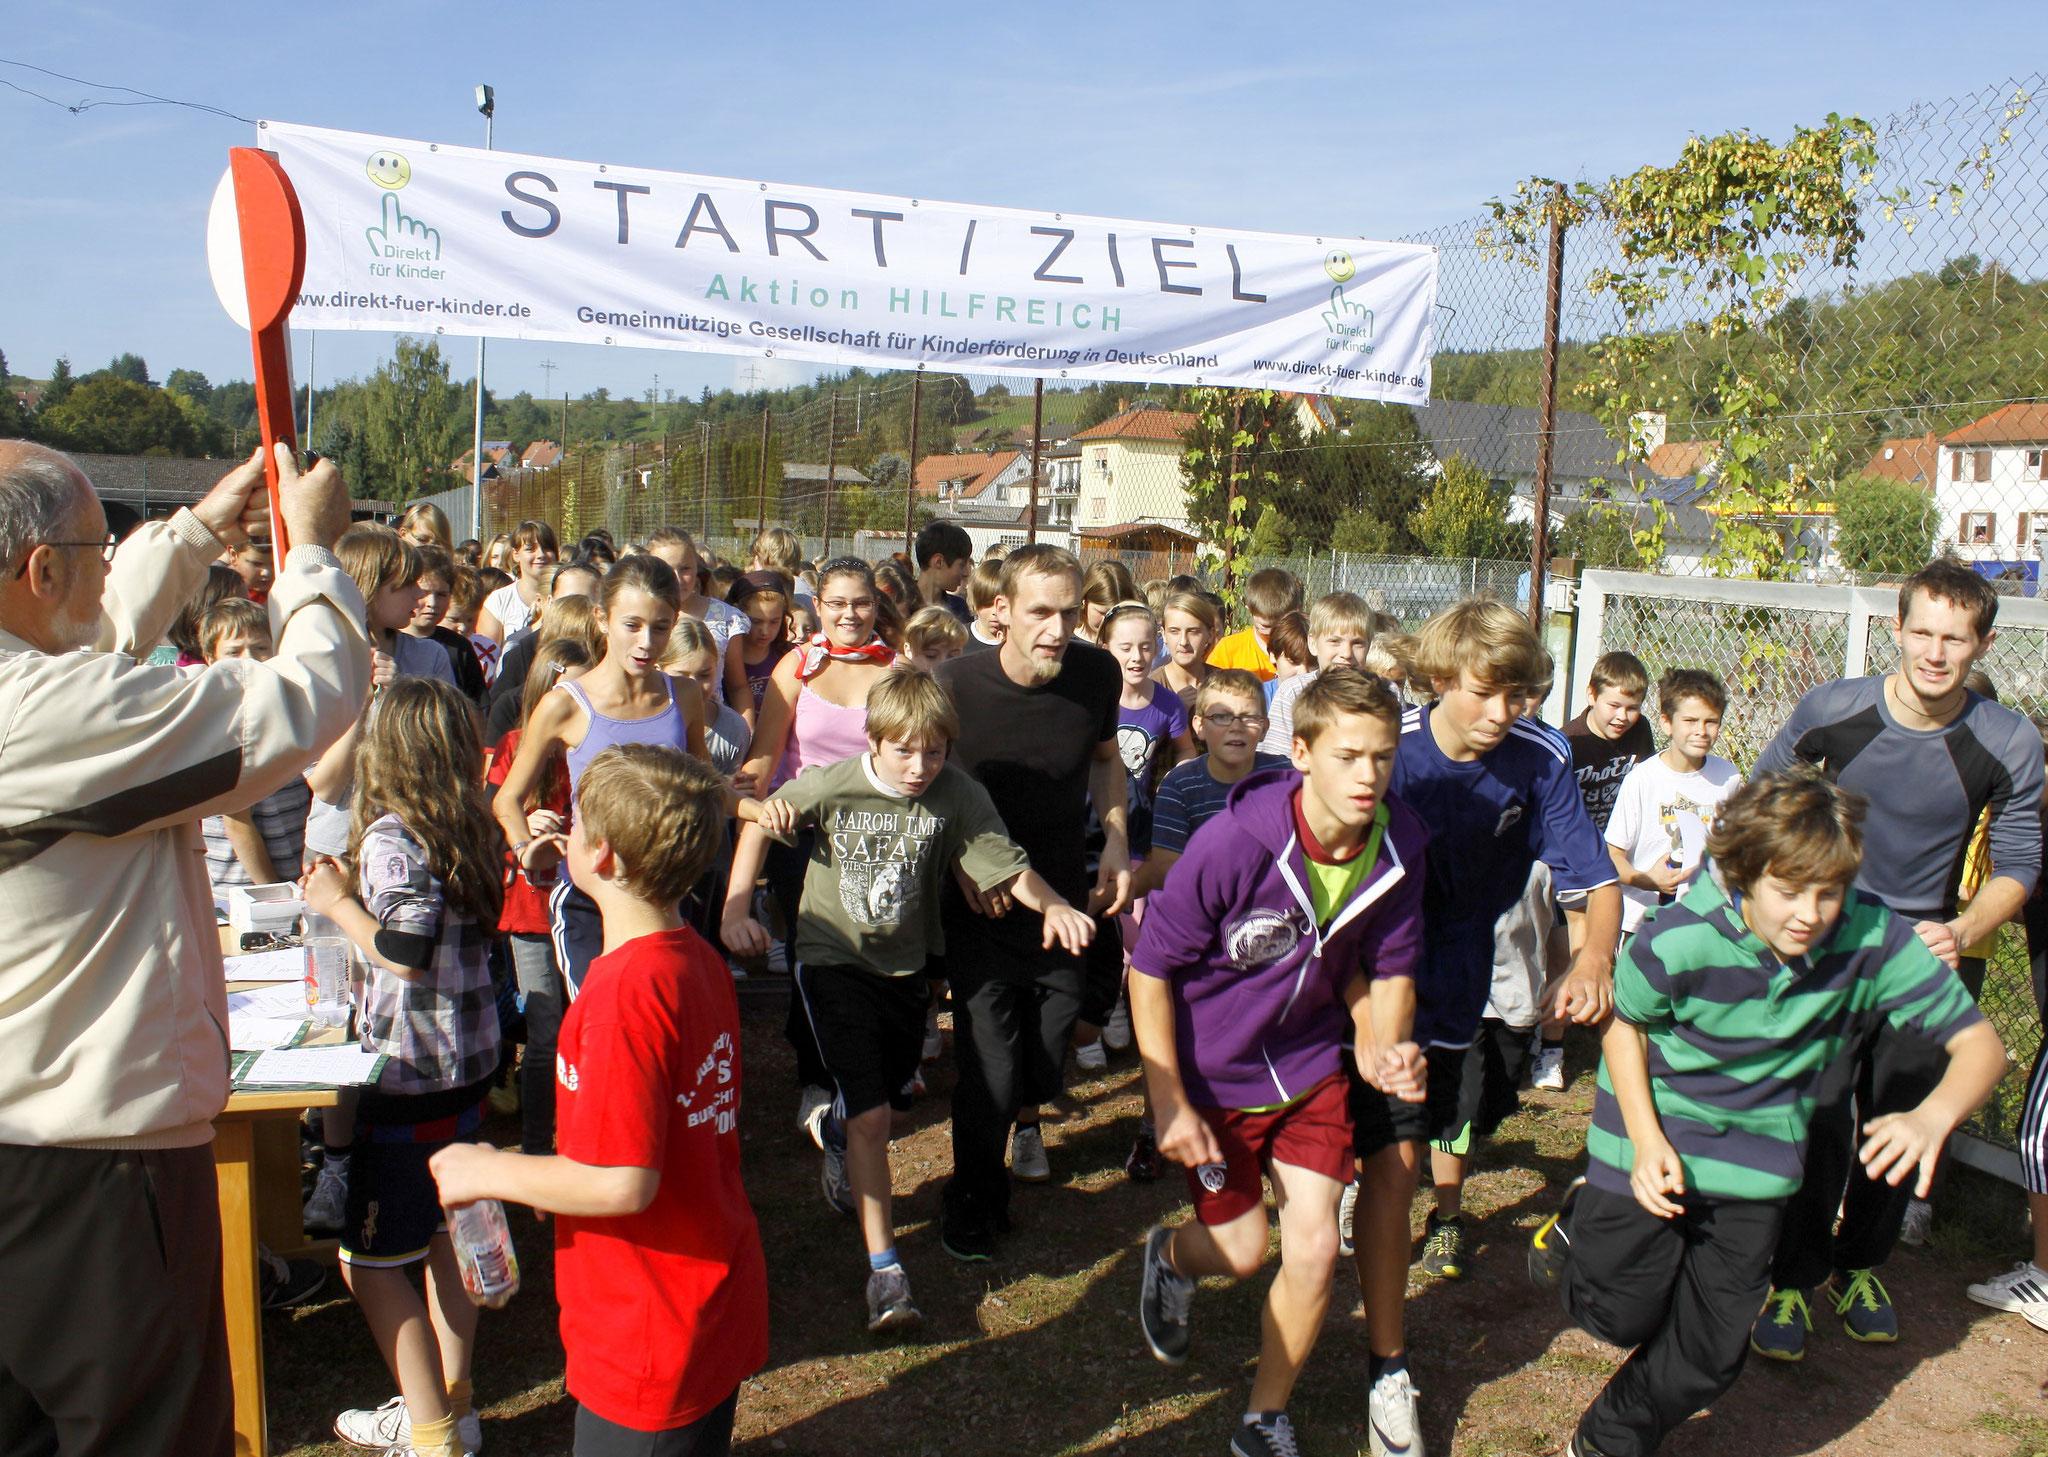 10 x Spendenlauf, Realschule plus in Altenglan